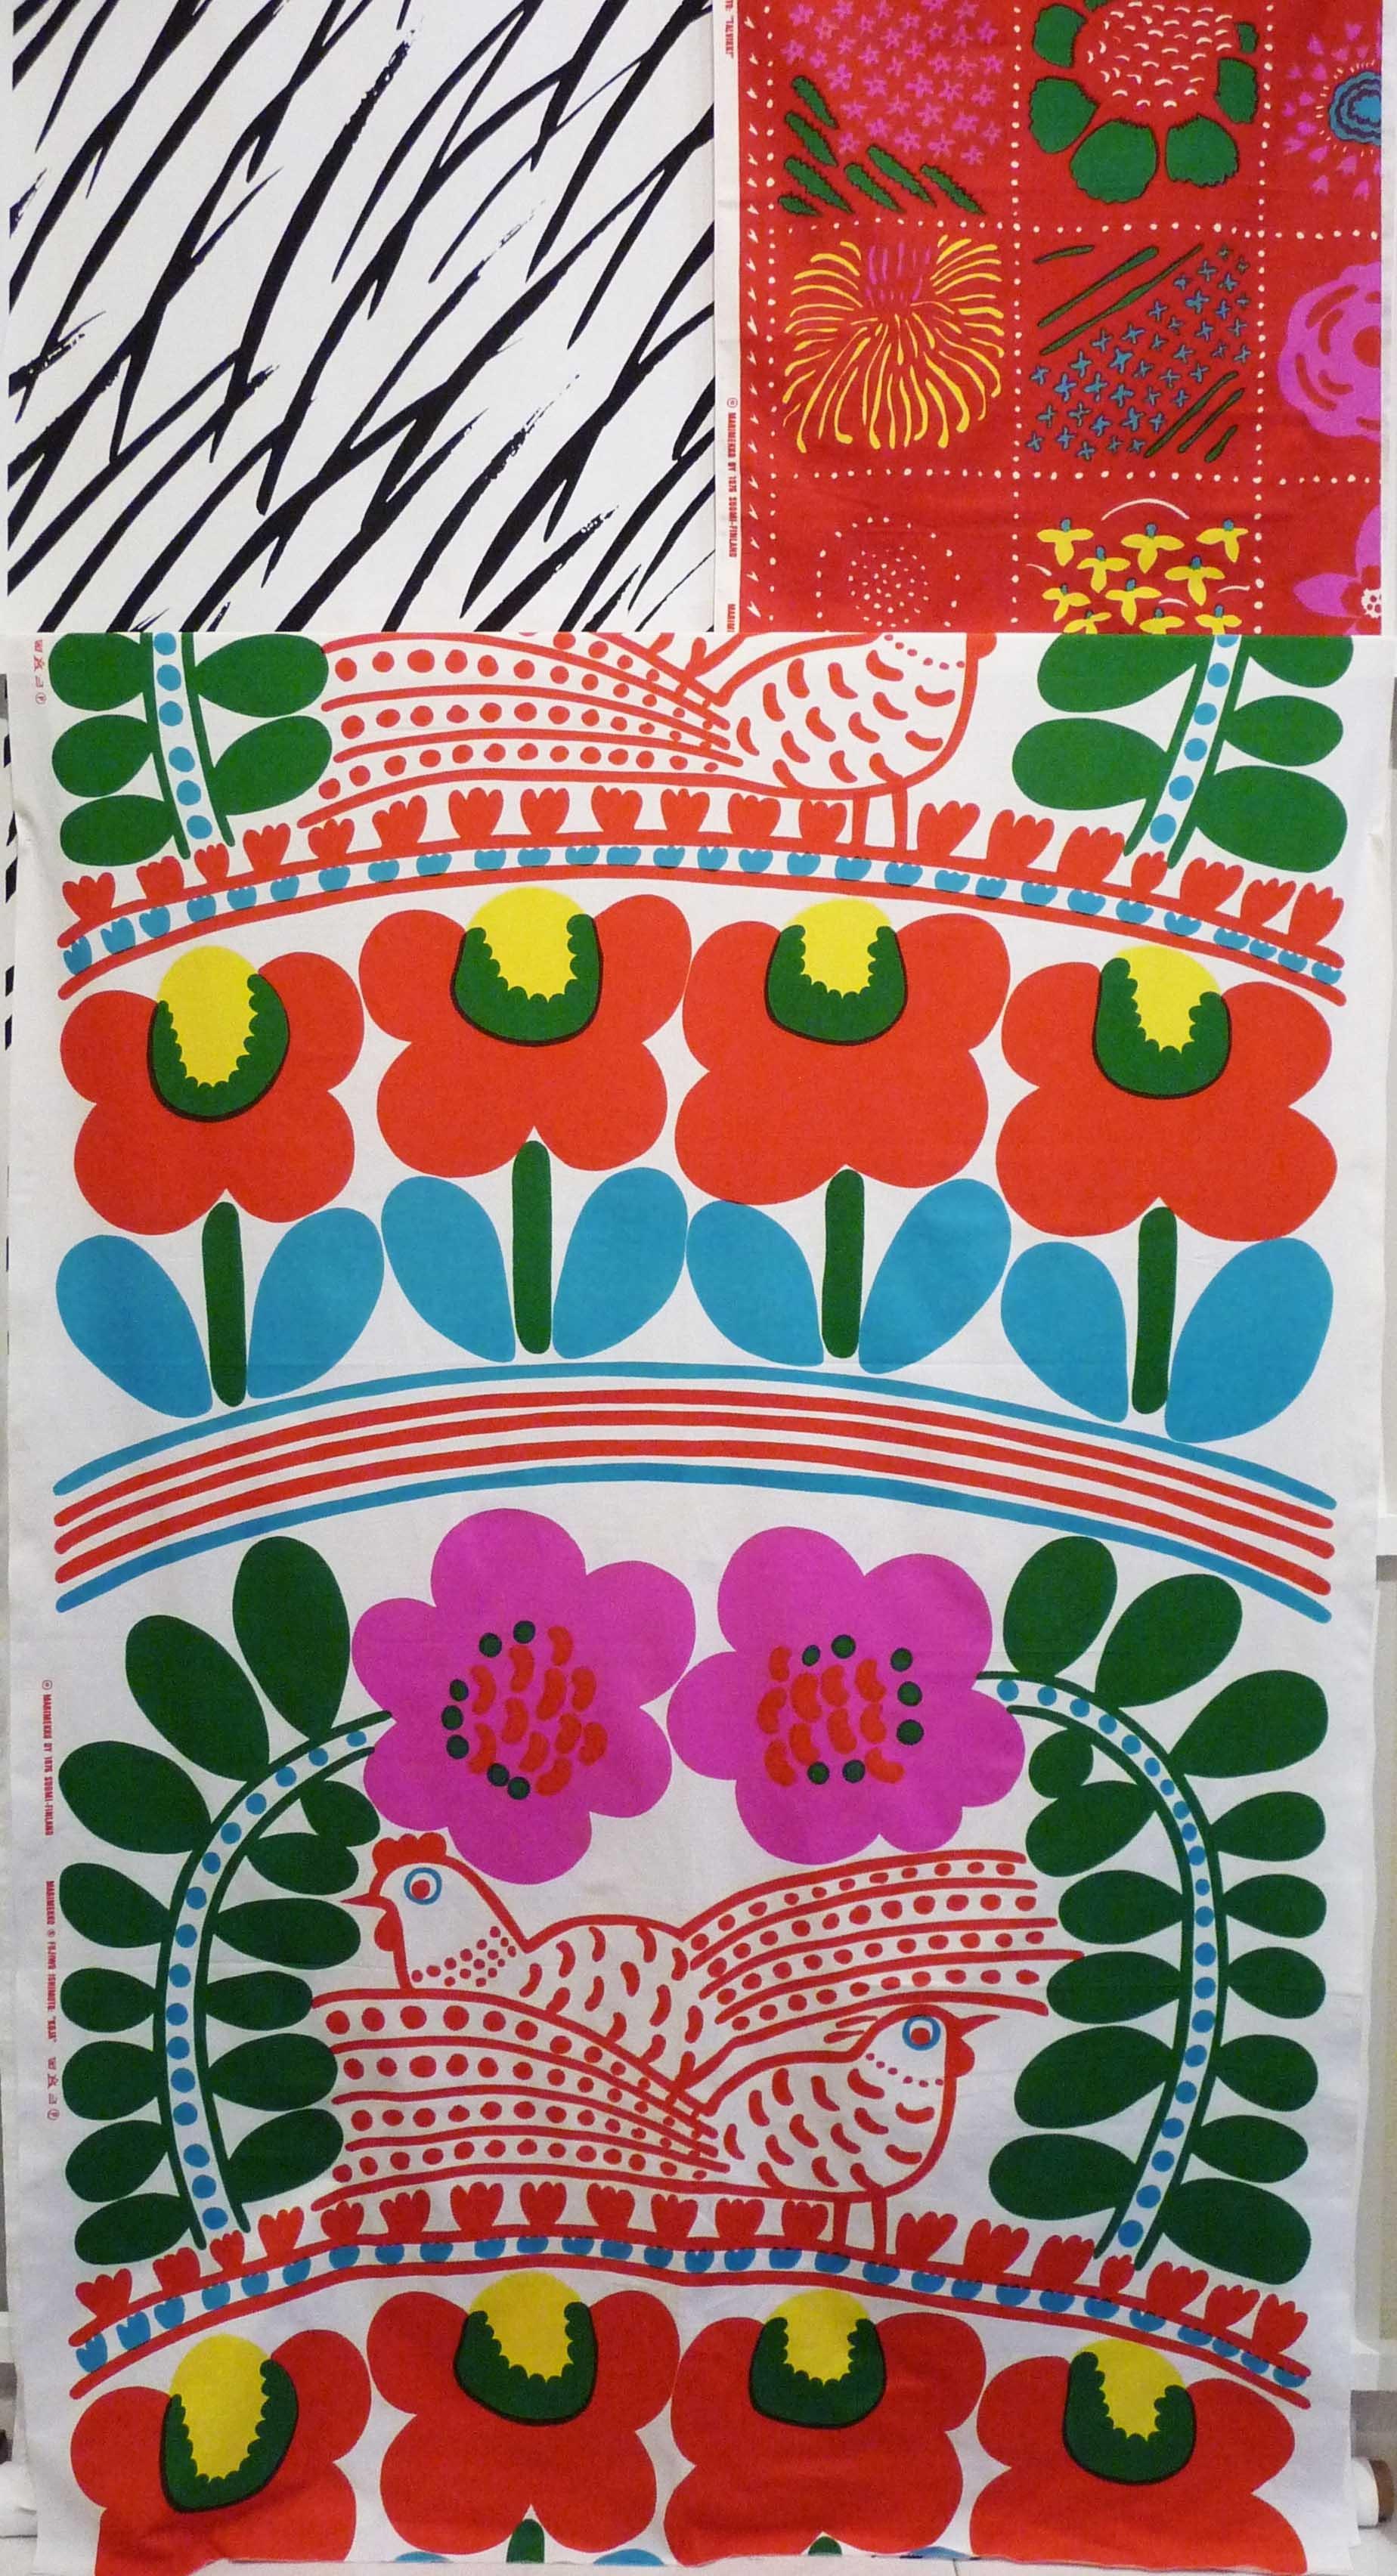 Vintage Marimekko Fabric Designedjapanese Textile Designer With Regard To Best And Newest Marimekko 'karkuteilla' Fabric Wall Art (View 14 of 15)